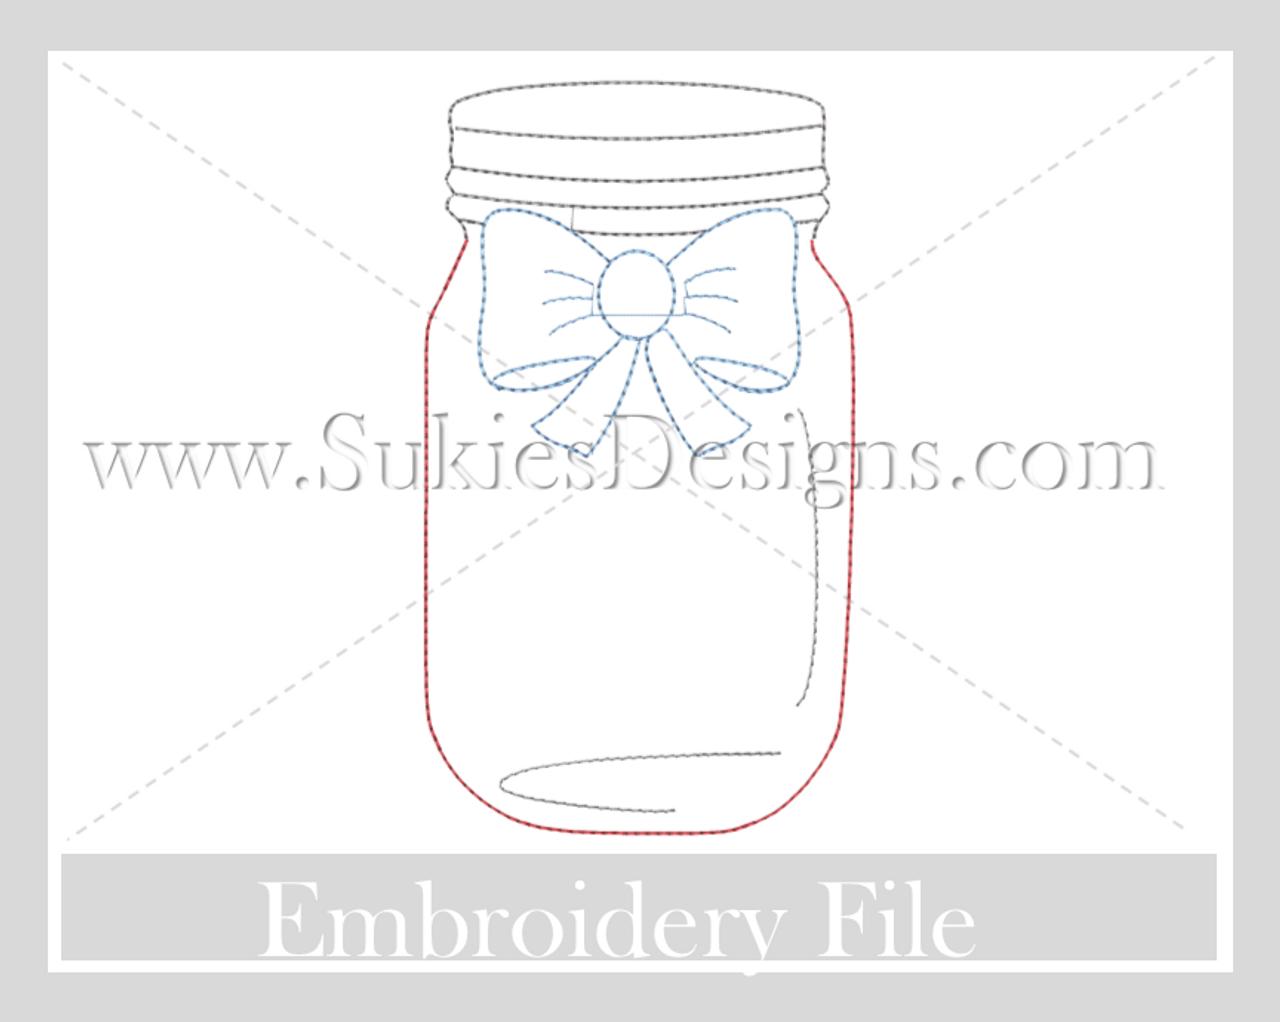 monogram 4th ofjuly mason jar quick stitch embroidery design